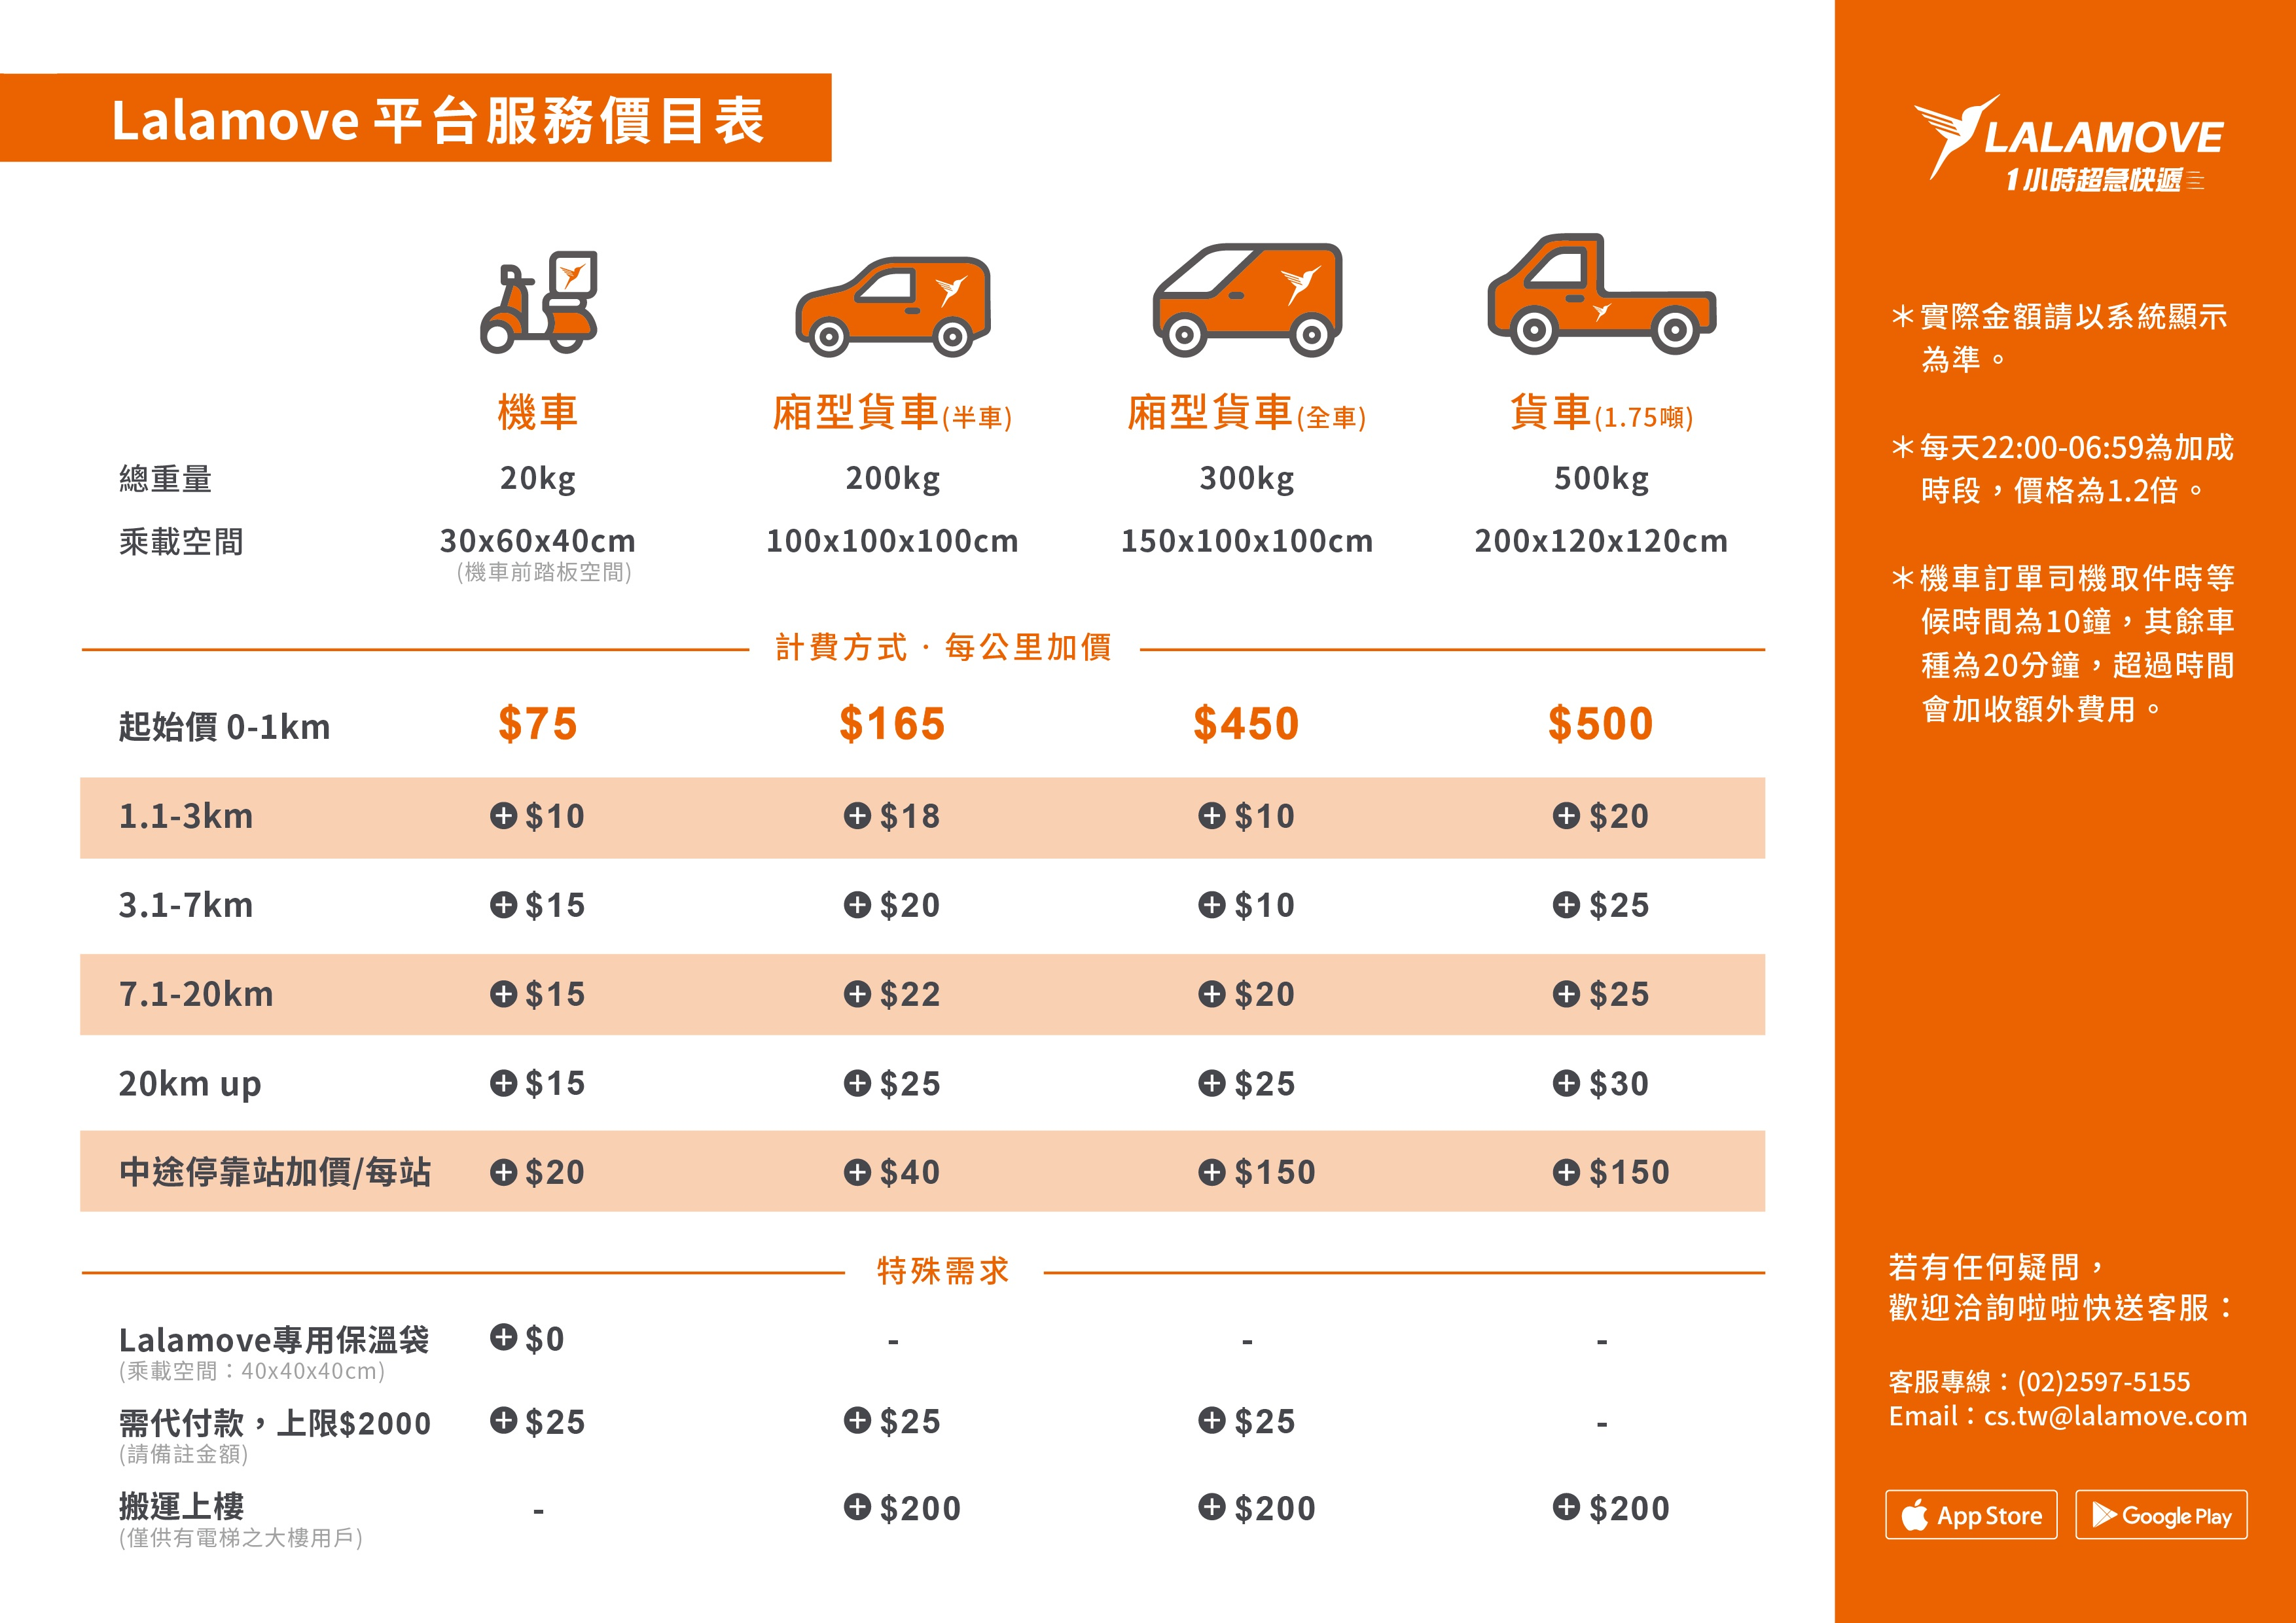 tw_20180223_blog_driver_zh_2018價目表.jpg